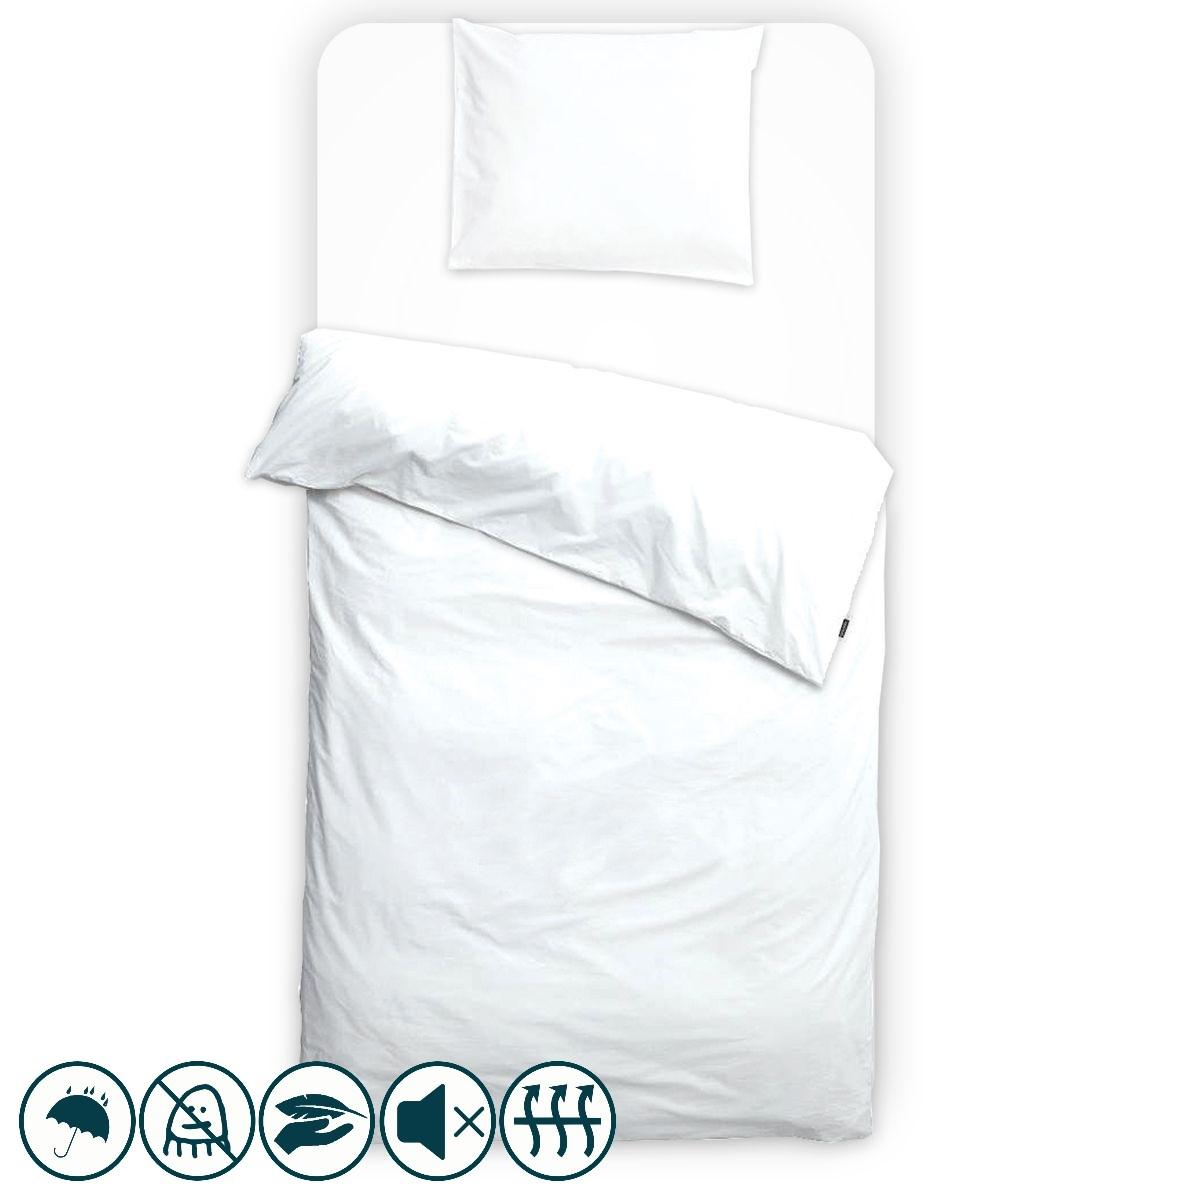 taie d 39 oreiller anti acariens unie blanche louis lesec. Black Bedroom Furniture Sets. Home Design Ideas